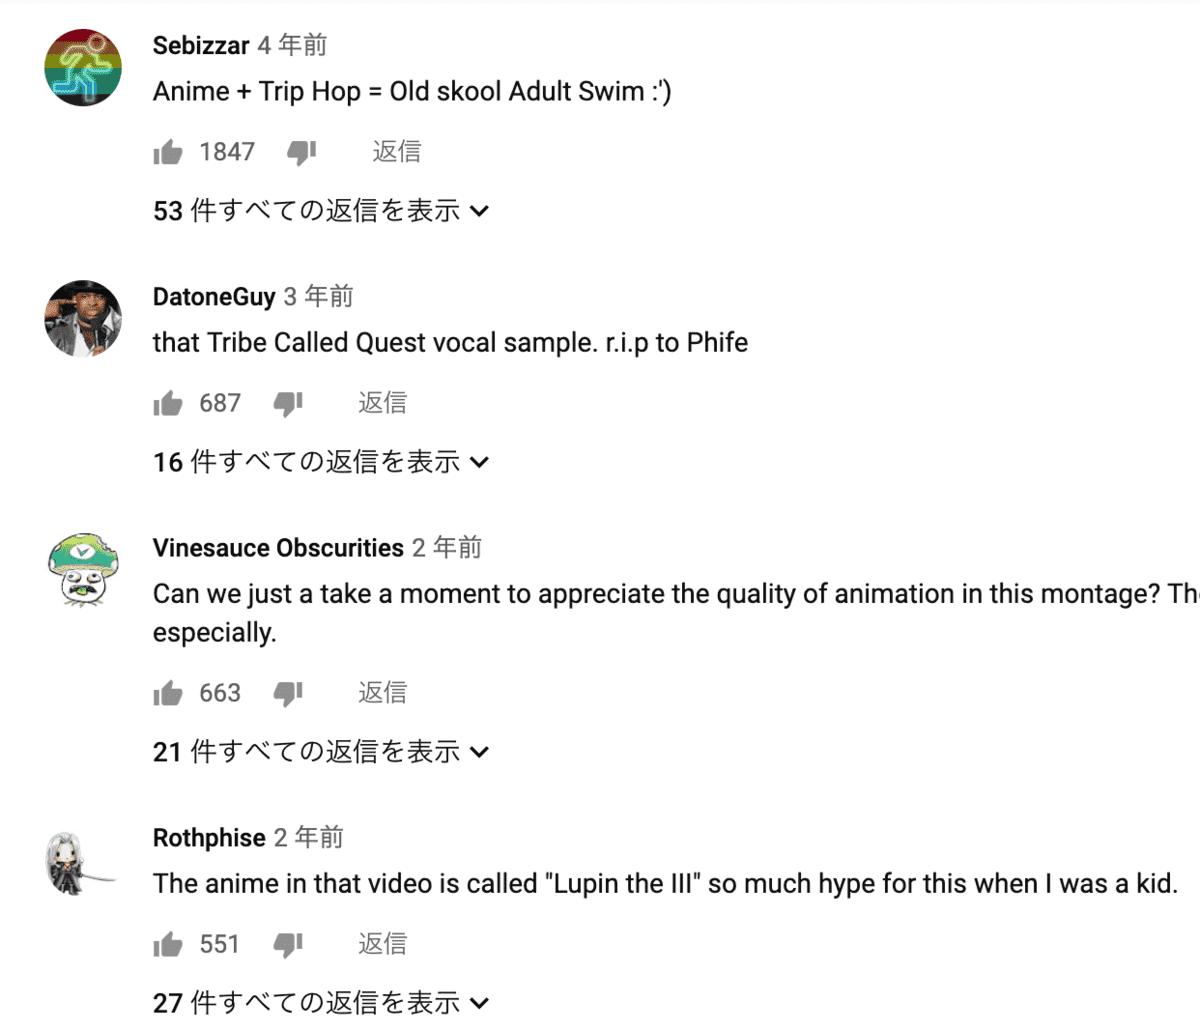 lofi hip hop ローファイヒップホップ anime 2012